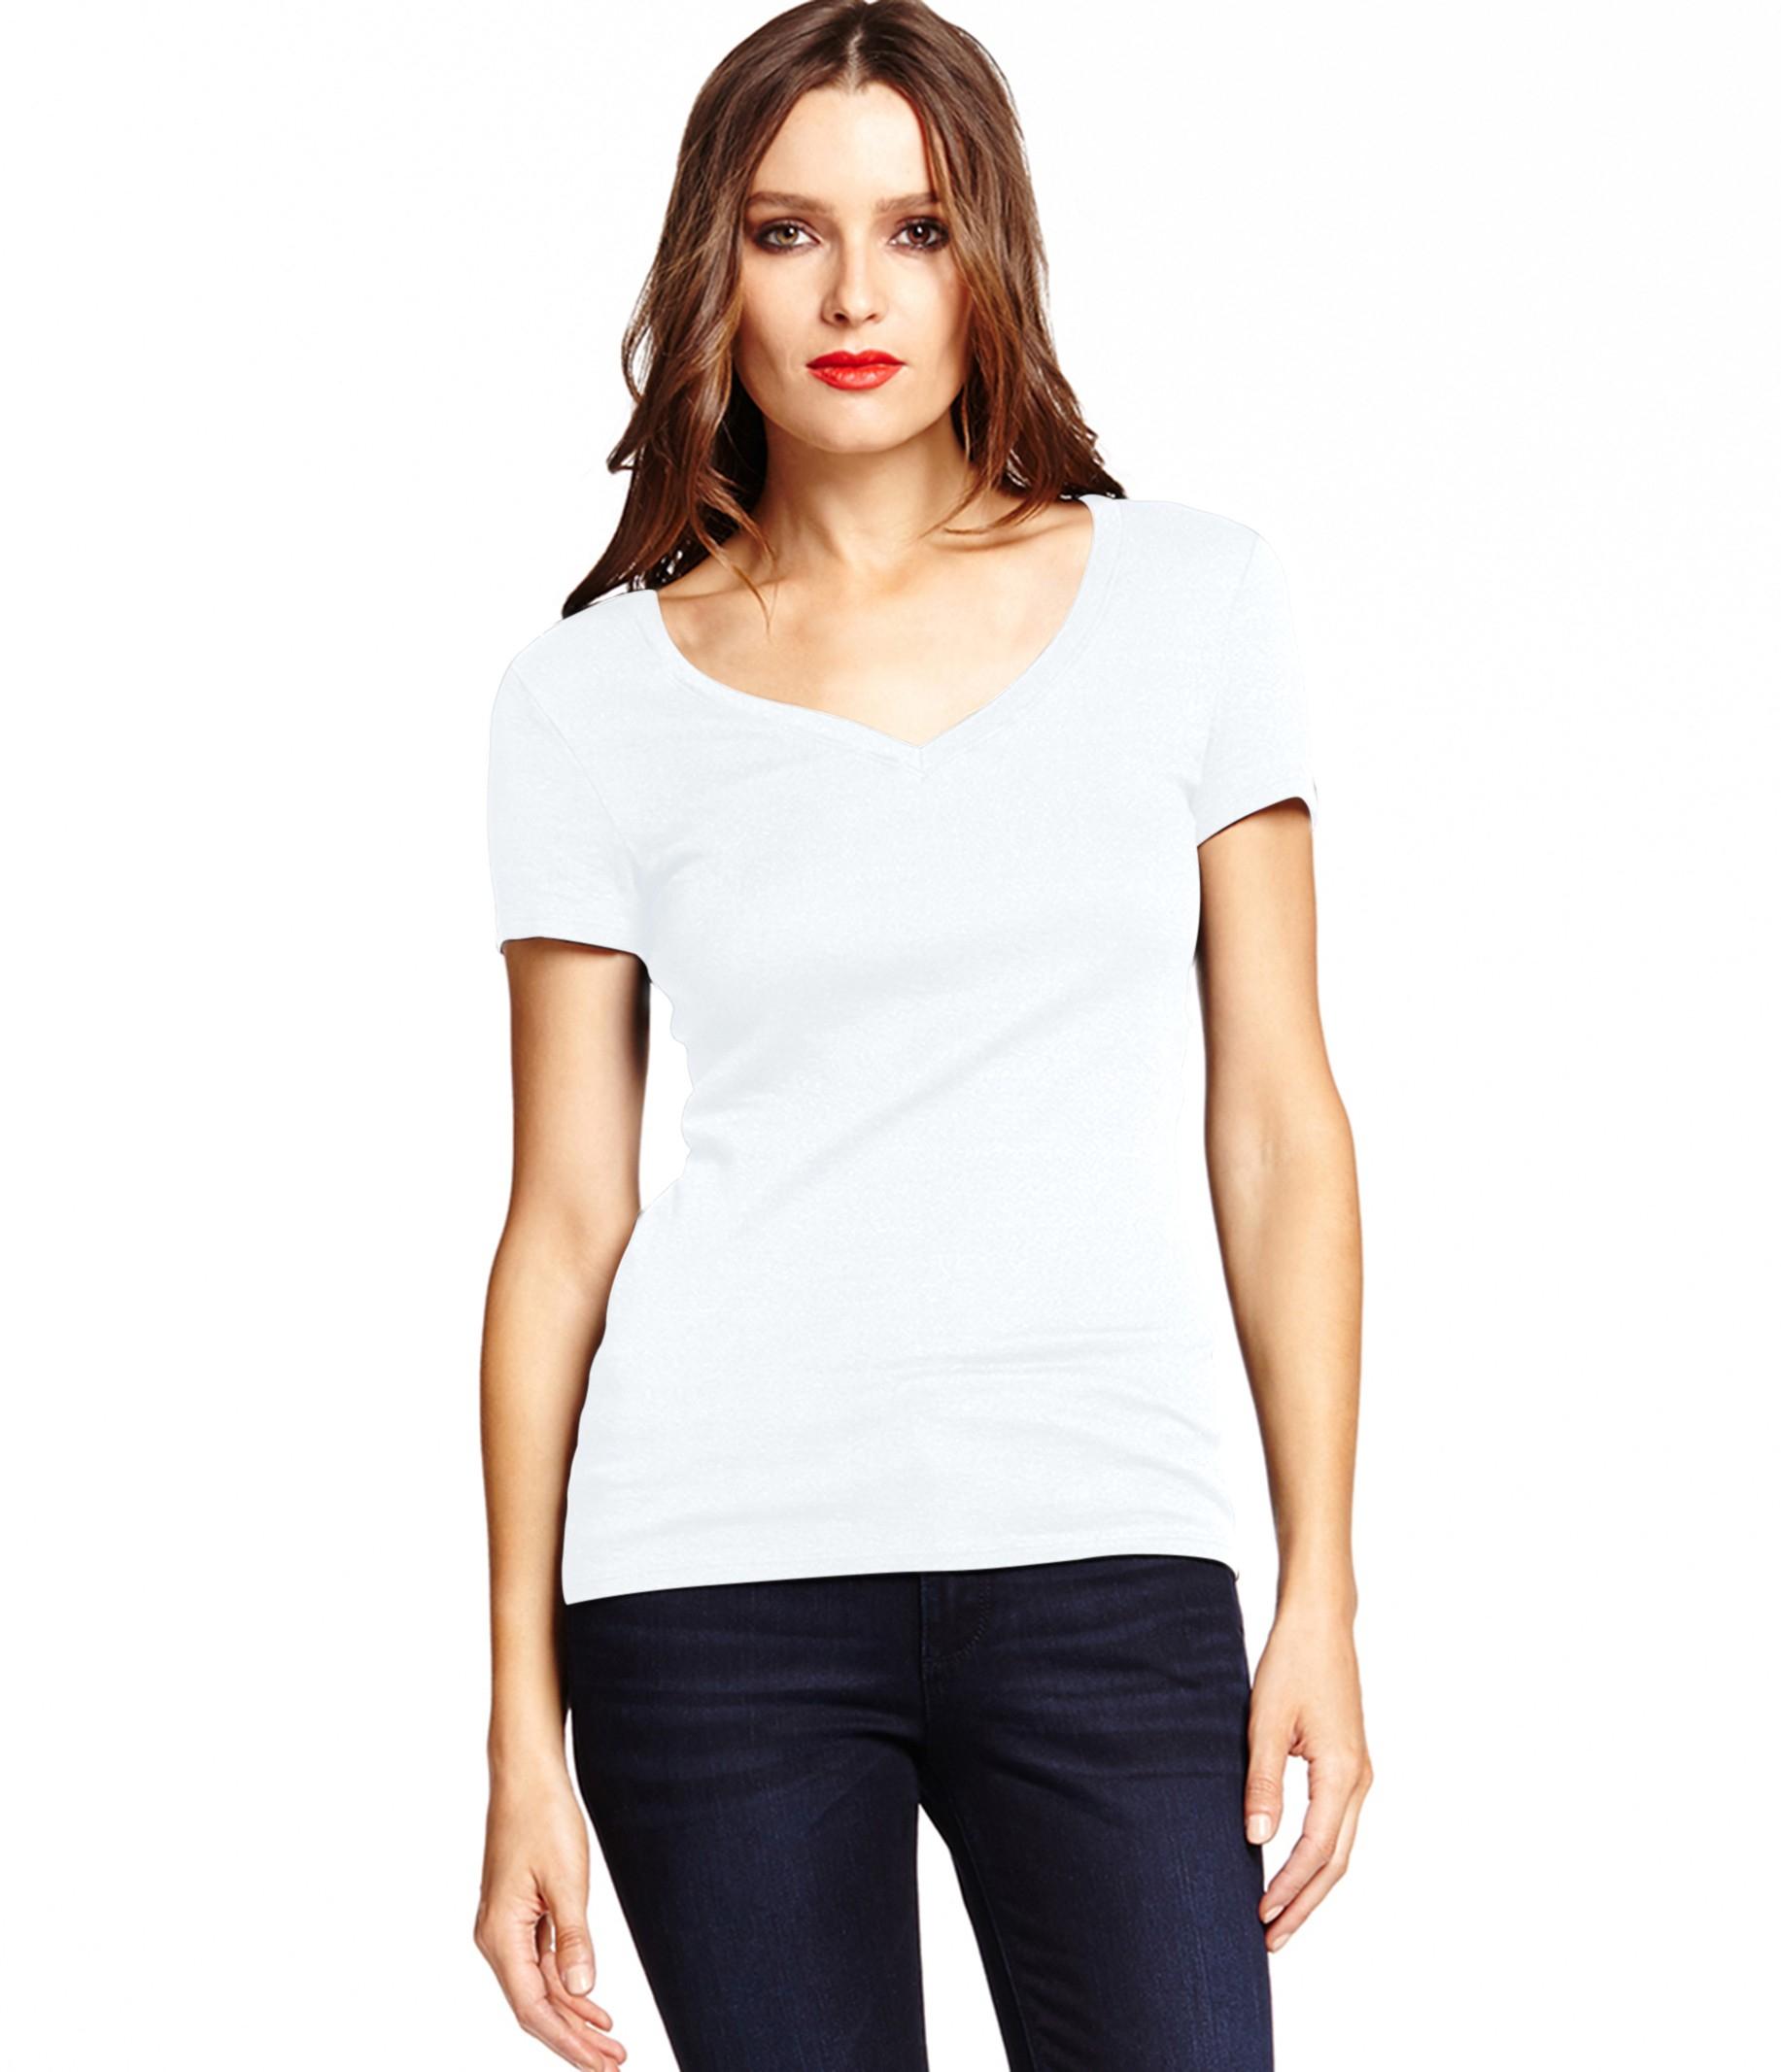 Michael stars shine short sleeve v neck tee in white lyst for Michael stars tee shirts